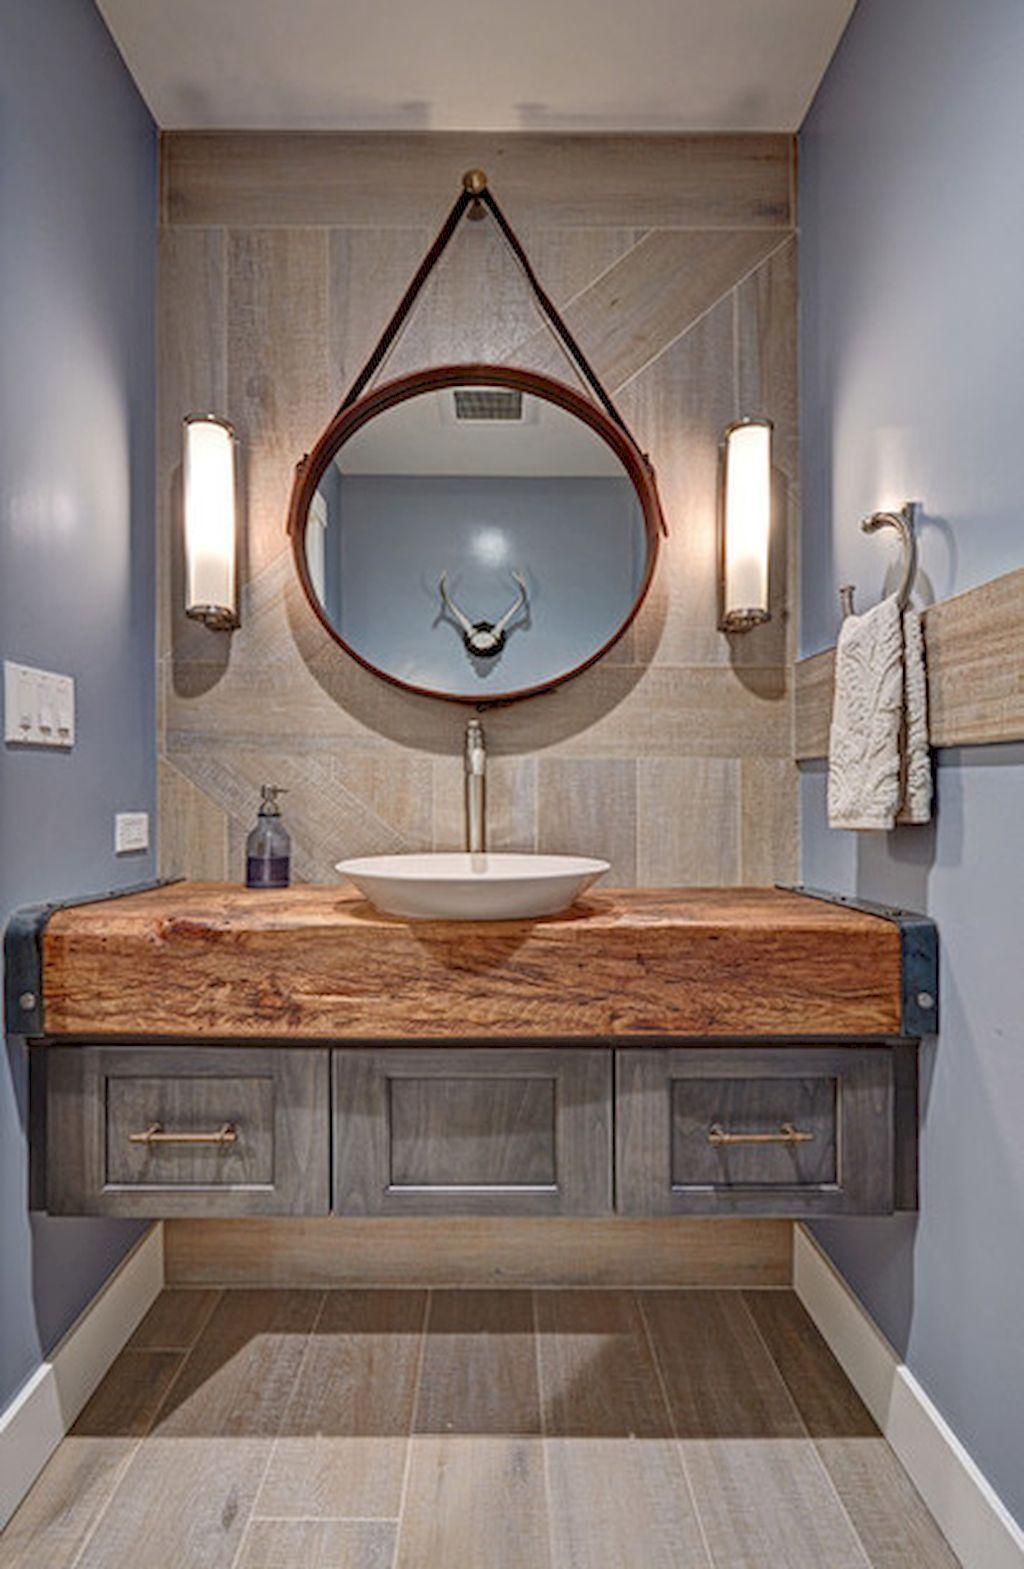 60 cool rustic powder room design ideas (34) | Rustic ...